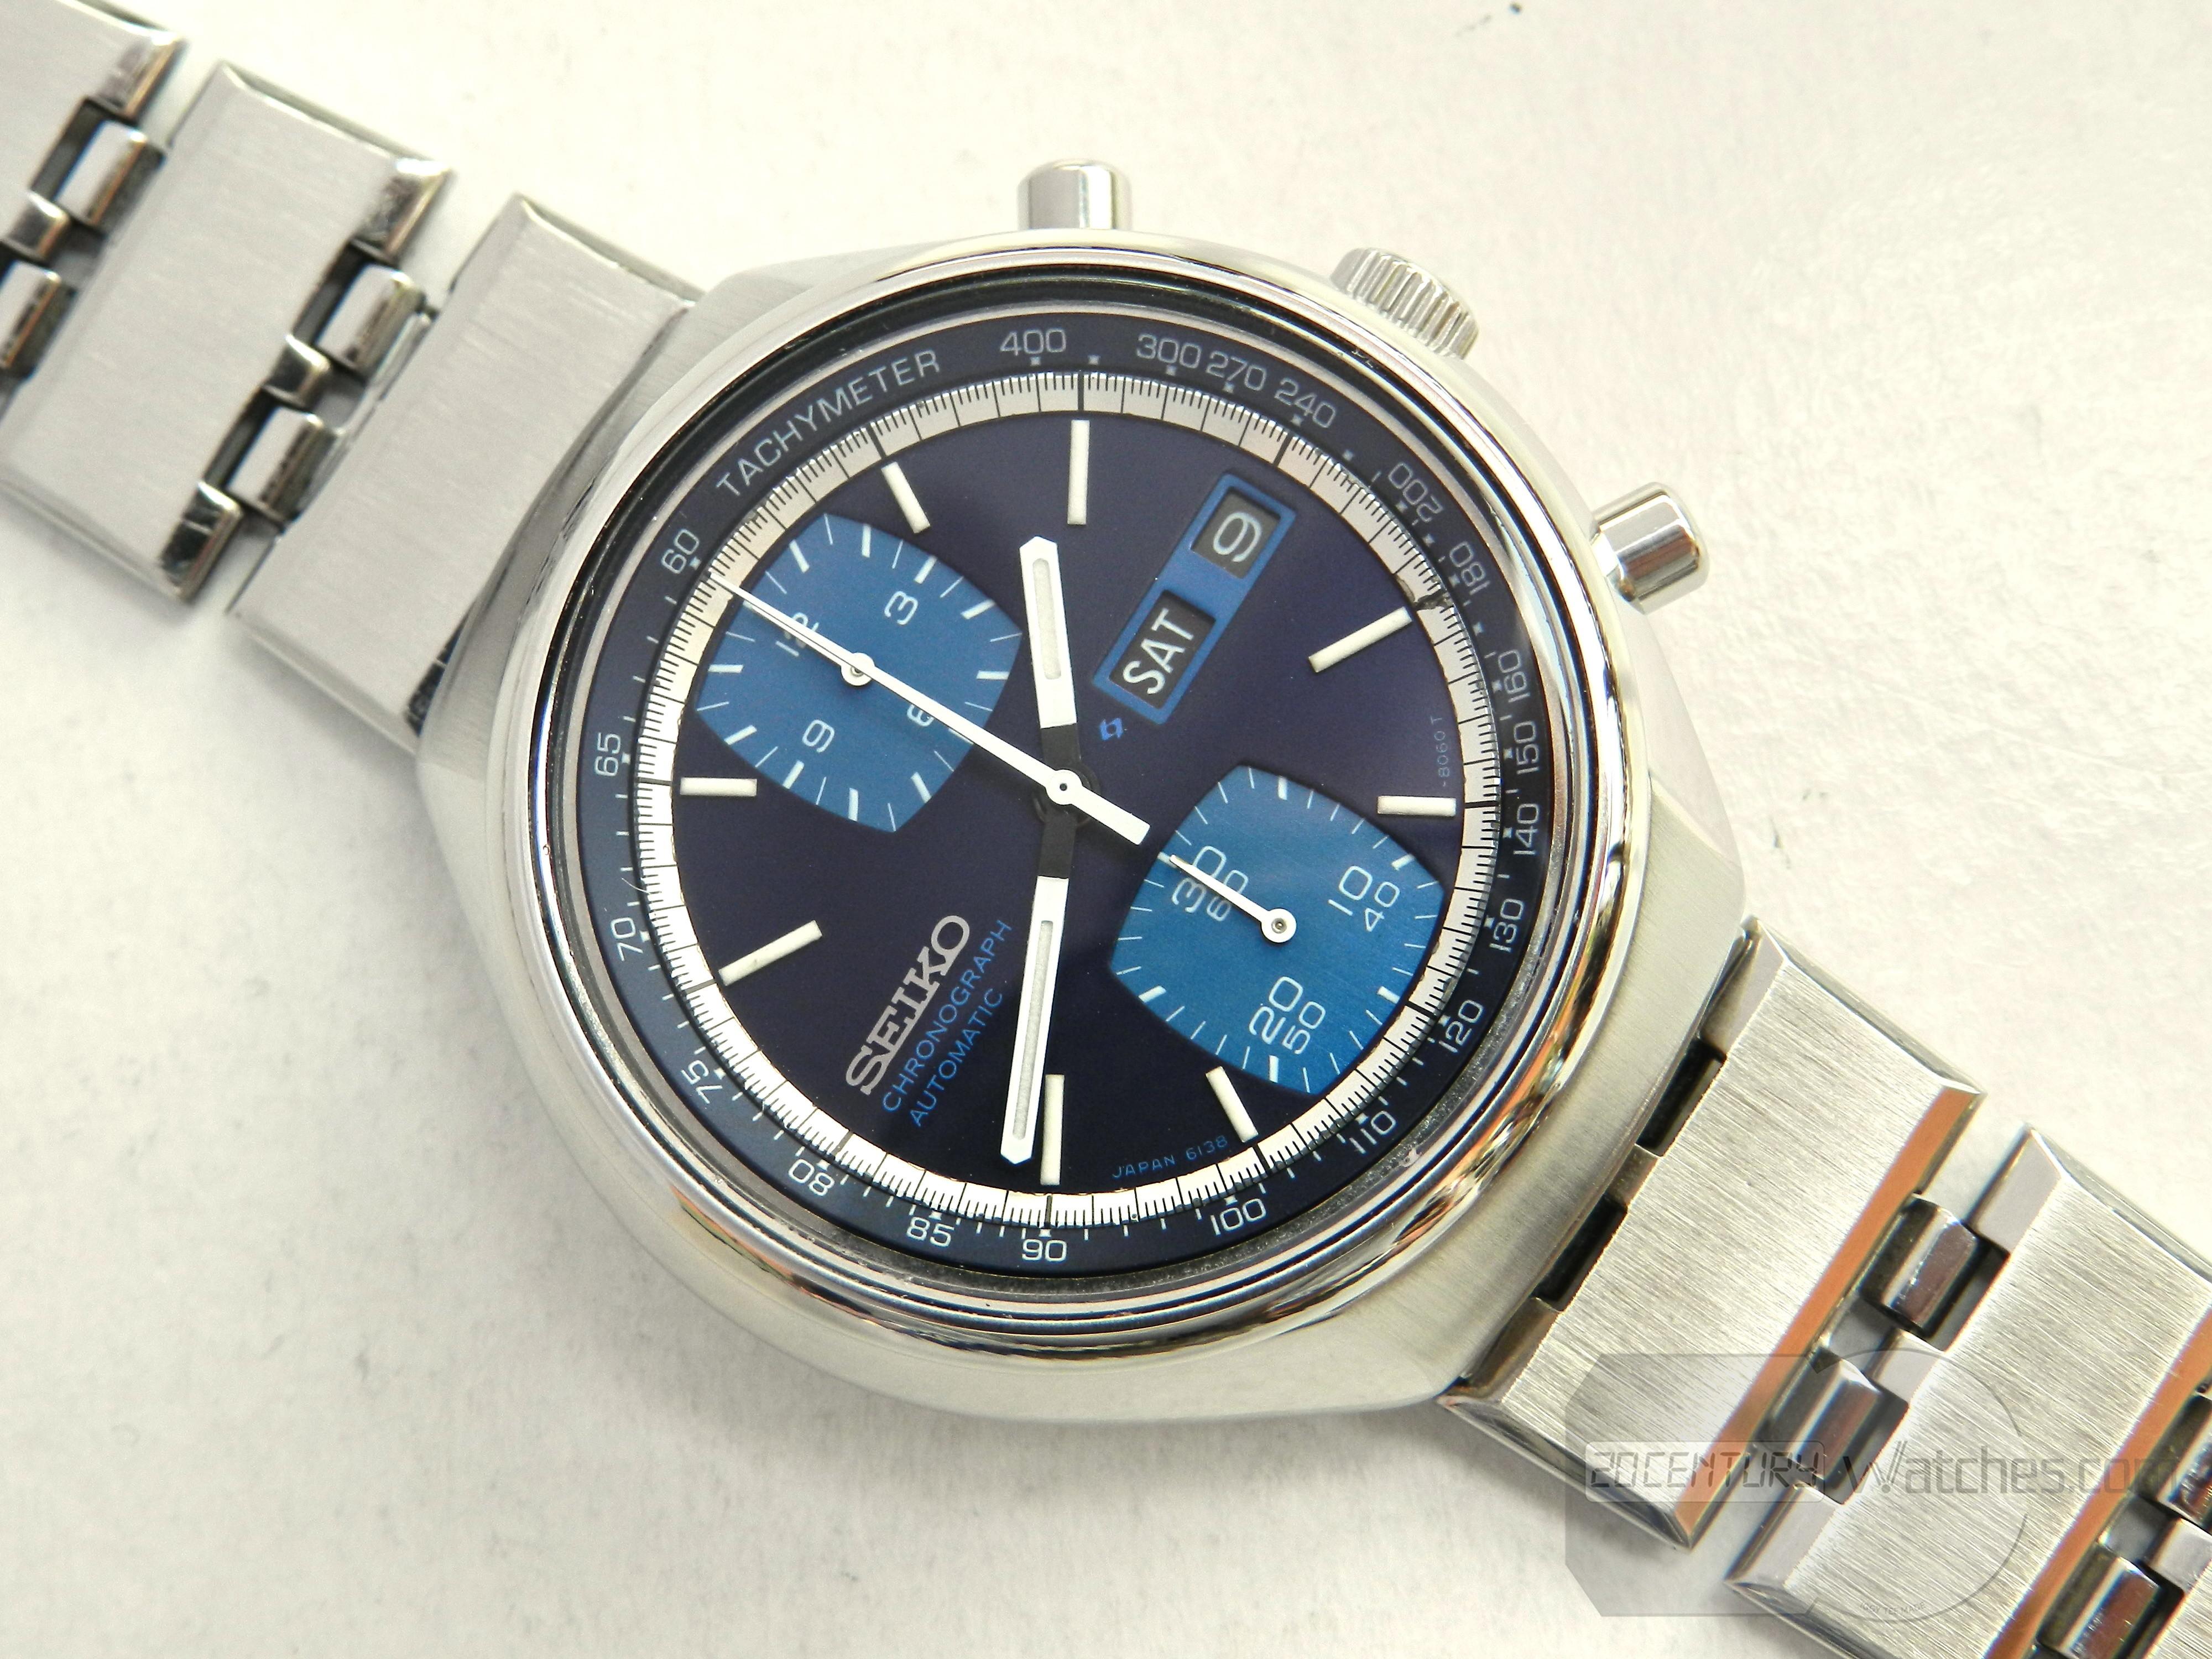 Seiko Automatic Chronograph 6138-8030